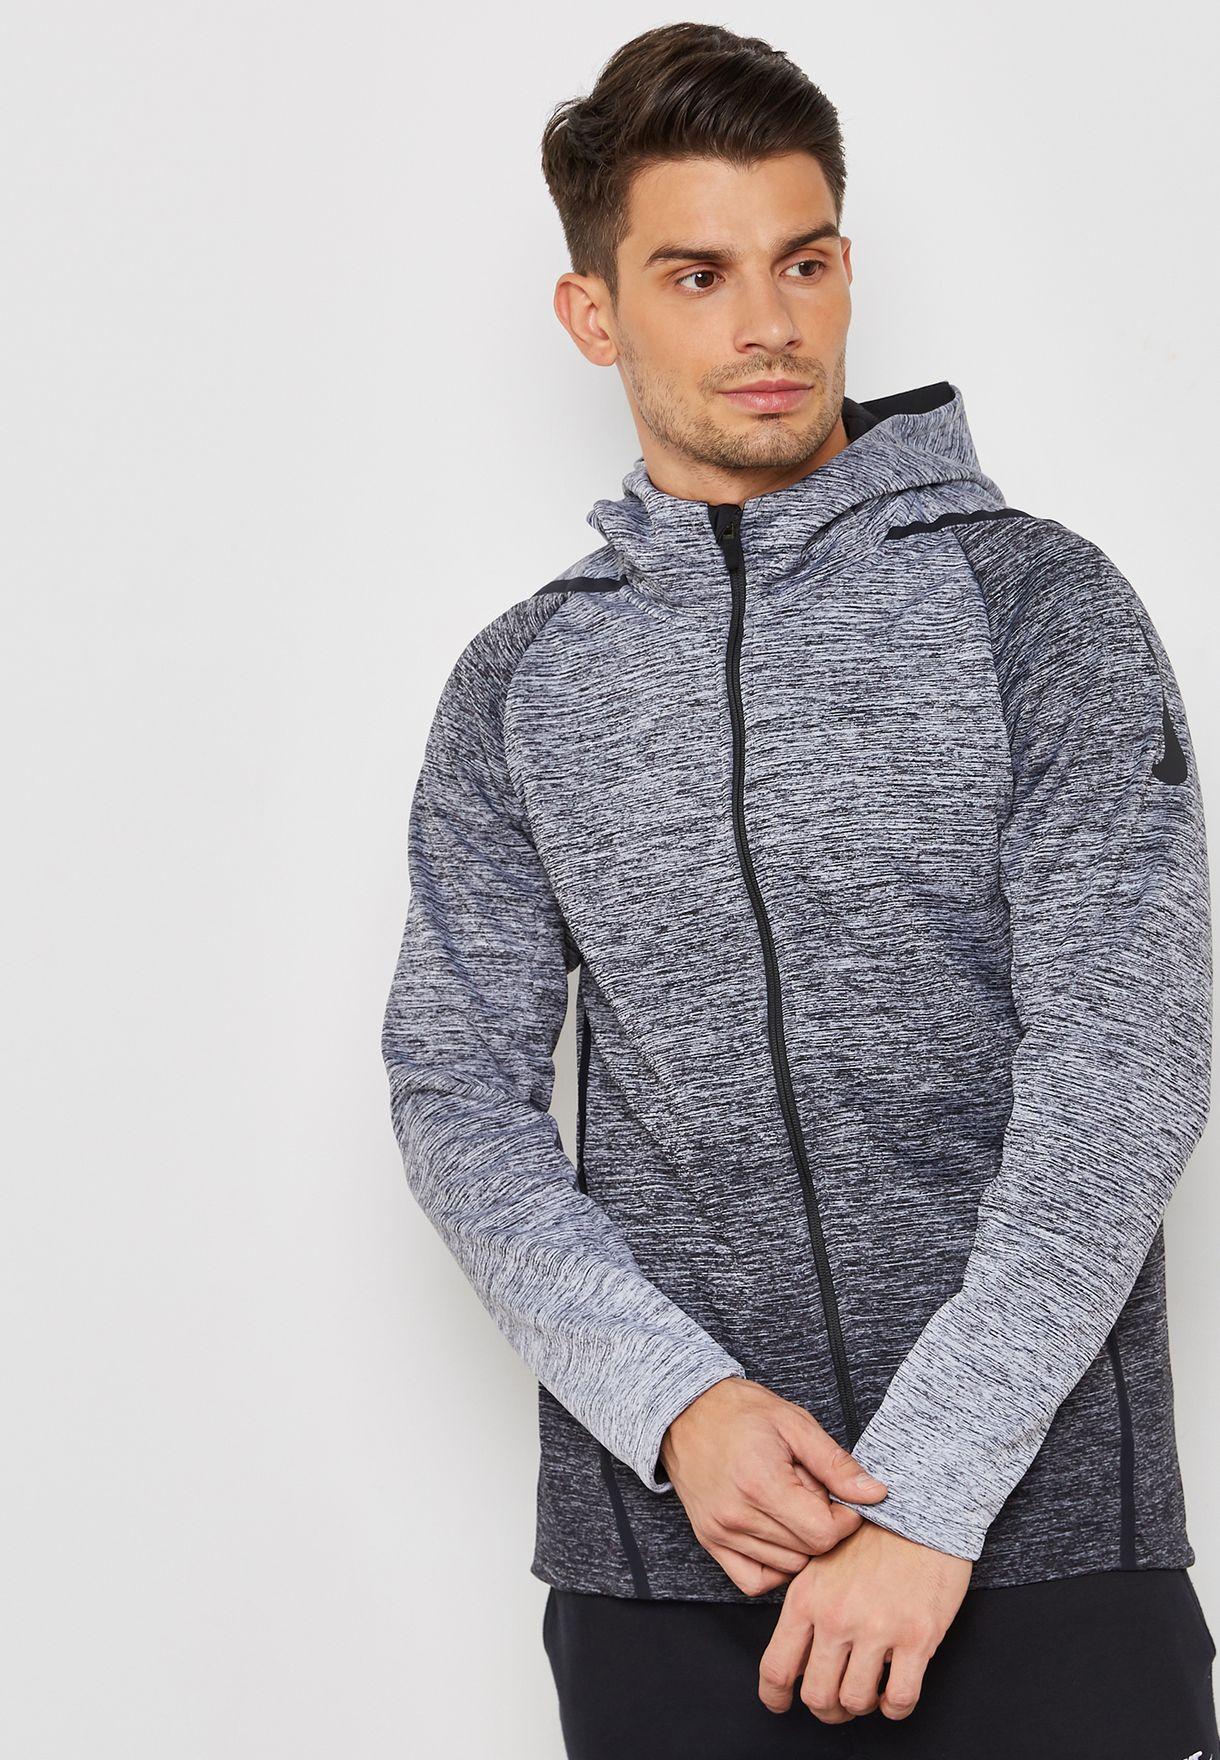 progenie Calamidad En expansión  Buy Nike multicolor Therma Sphere Max Jacket for Men in MENA, Worldwide    932038-010